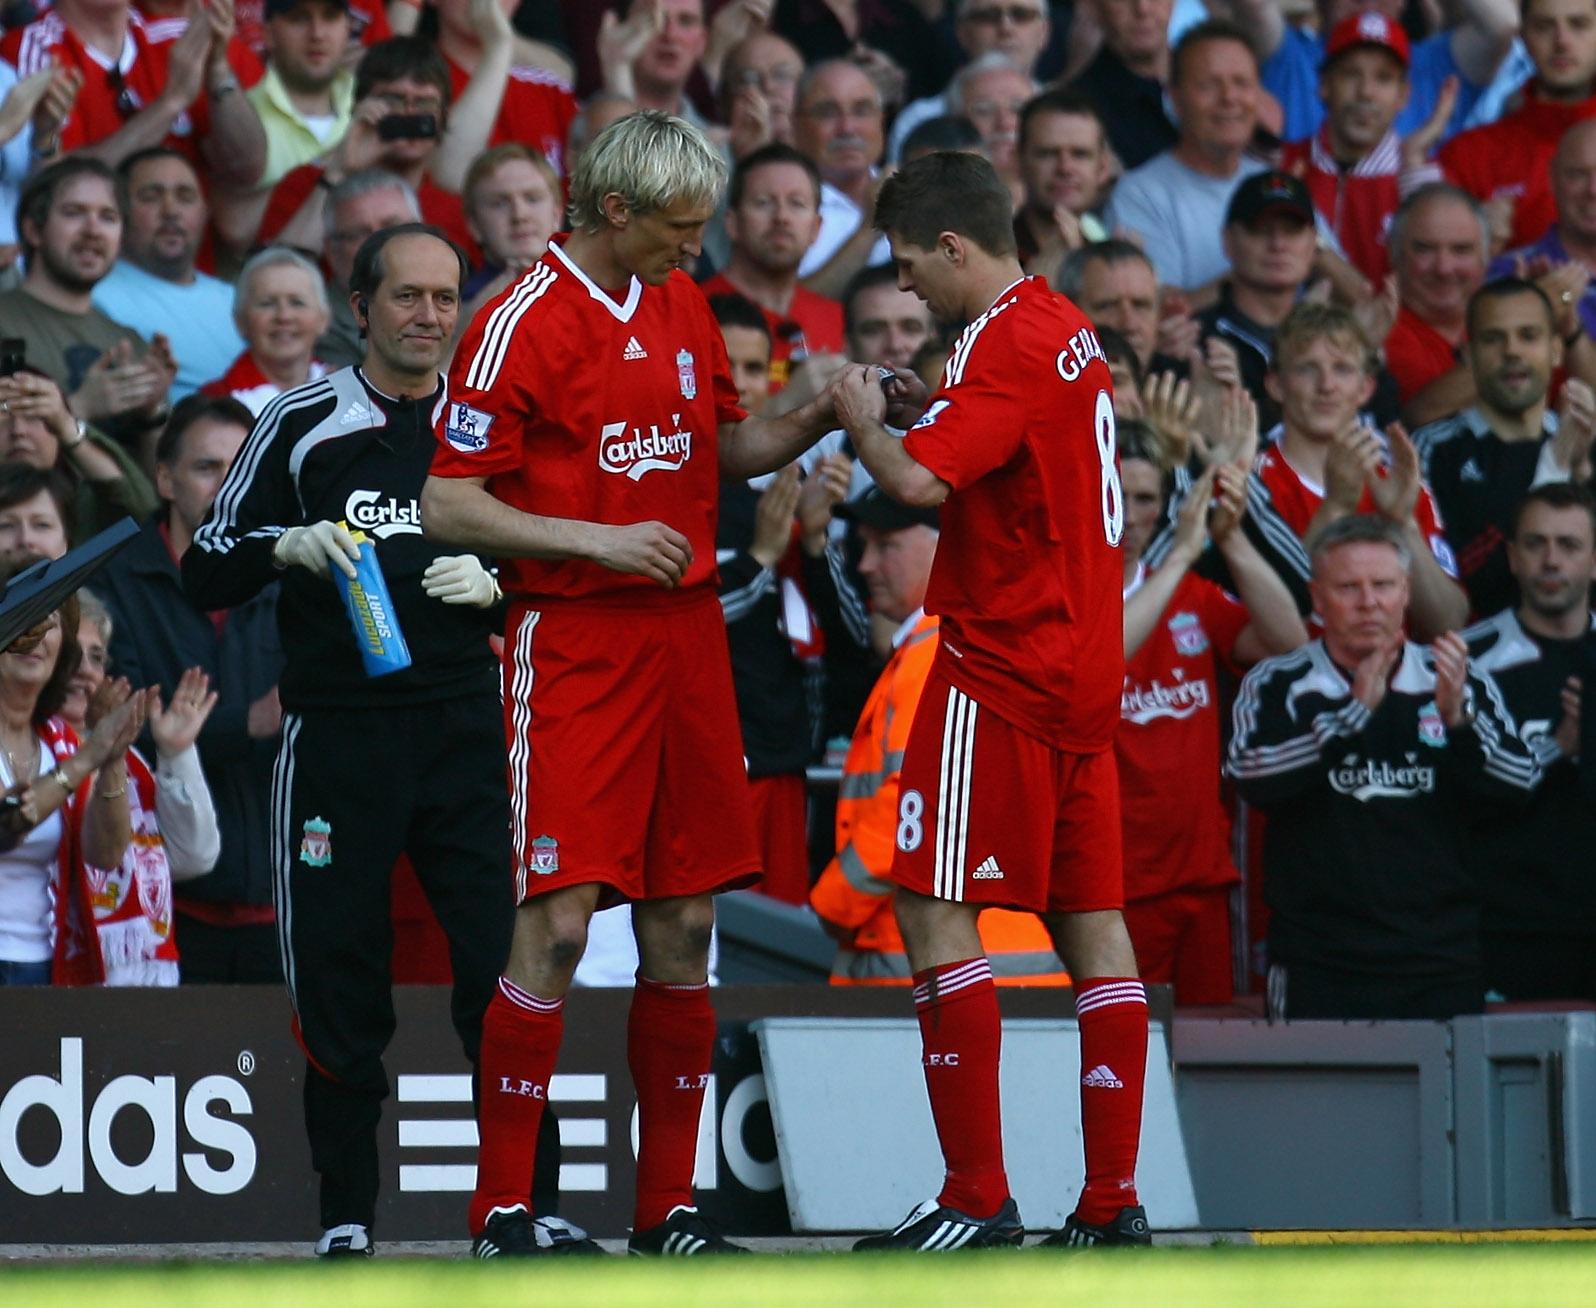 Sami Hyppia and Steven Gerrard